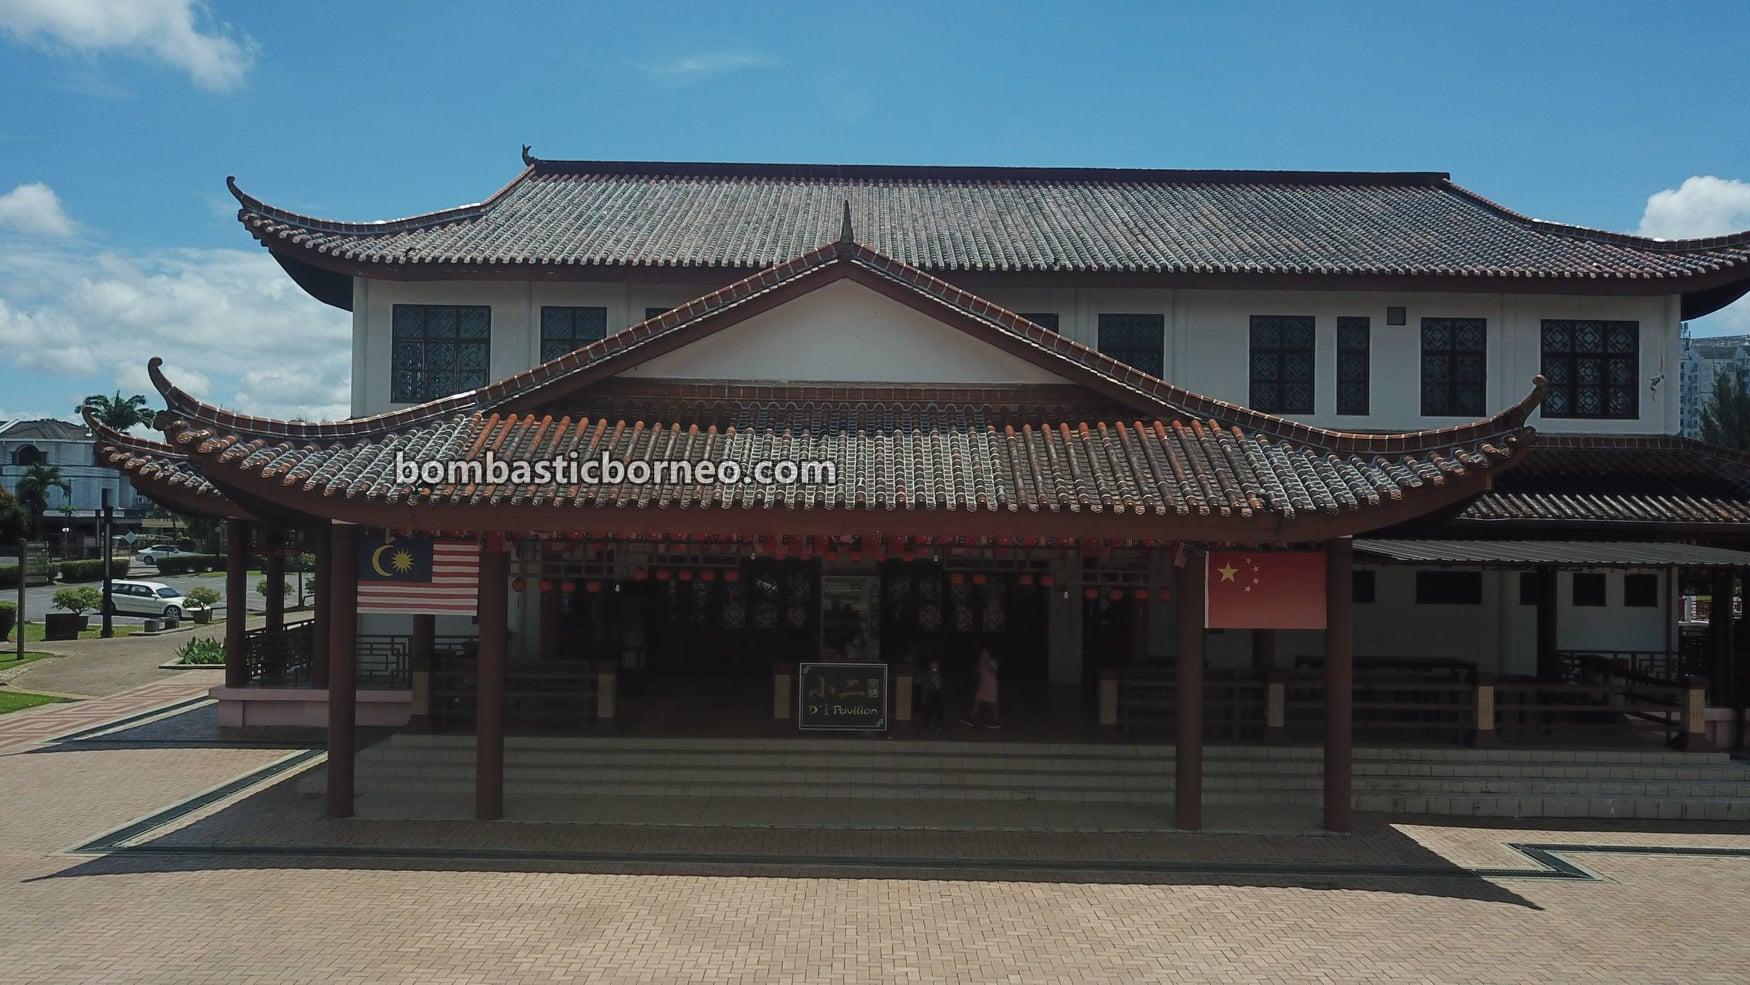 Malaysia-China Friendship Park, Taman Sahabat, Garden Park, Admiral Cheng Ho, destination, fish feeding, outdoor, jogging, walking, Tourism, travel locally, Borneo 马来西亚砂拉越, 马中友谊公园鄭和, 古晋运动旅游景点,